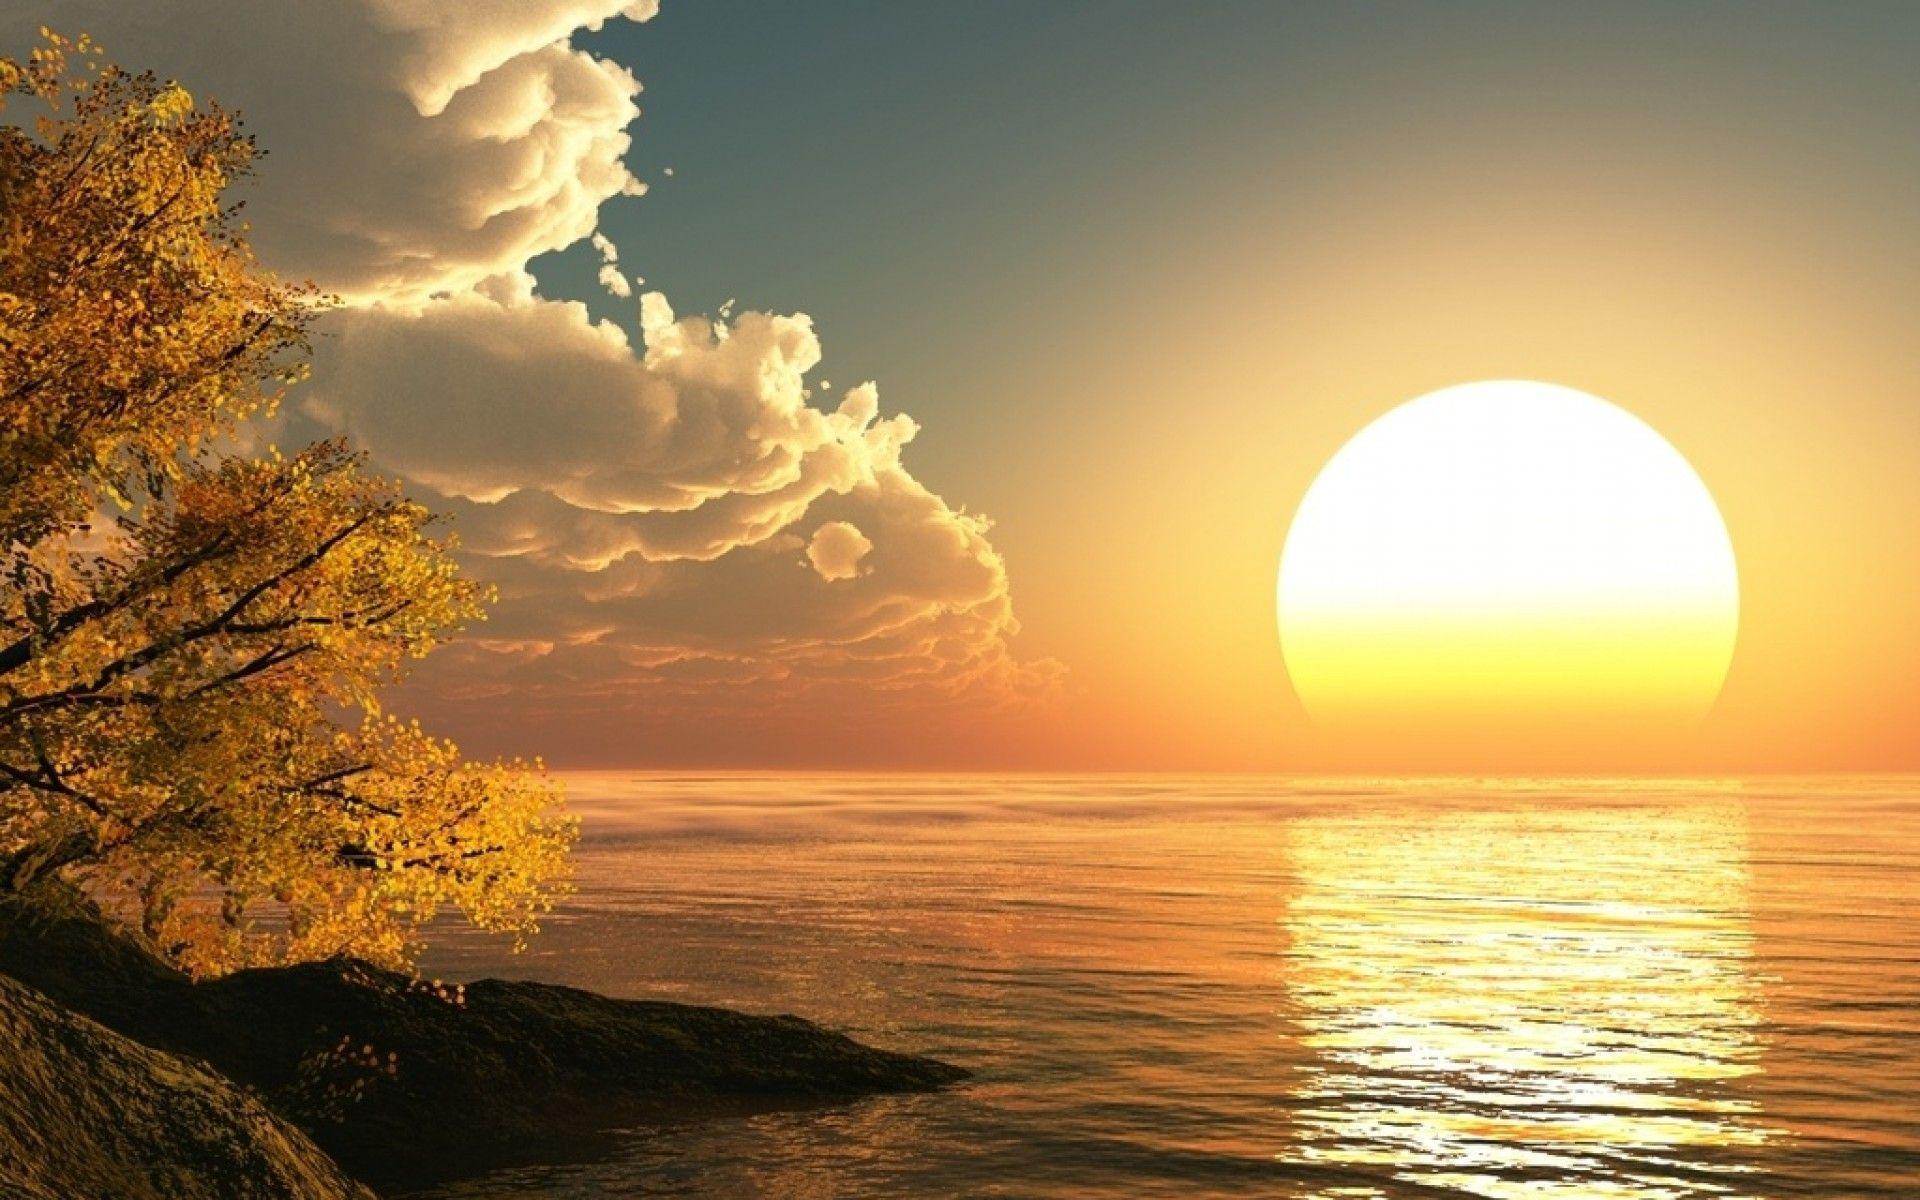 Rising Sun Wallpapers - Full HD wallpaper search